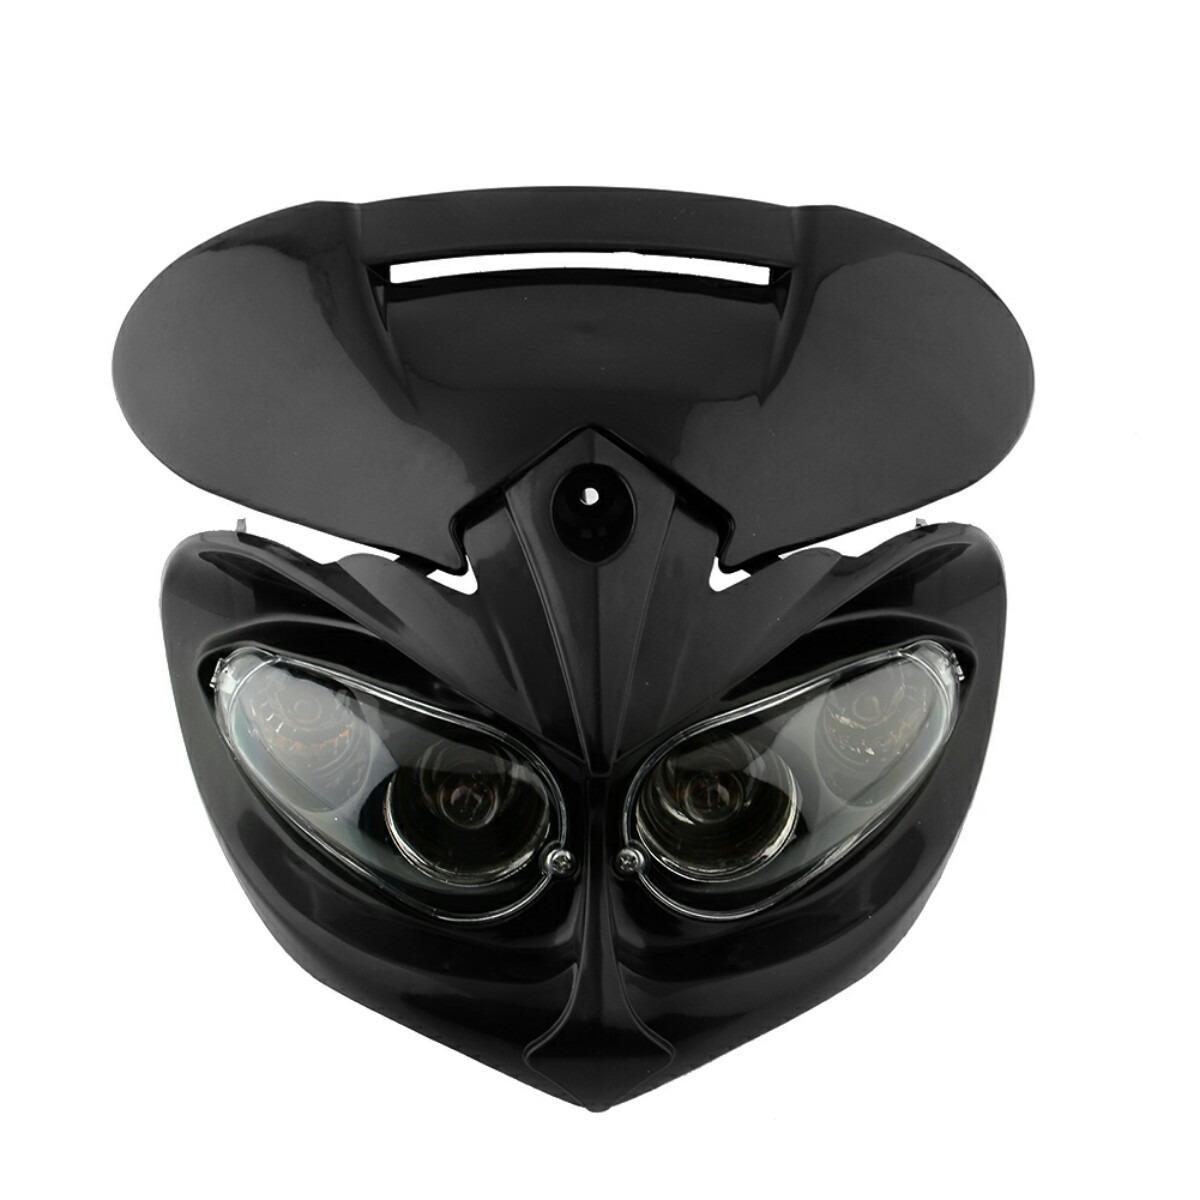 Farol mascara universal para motos c pisca integrado r for Farol exterior de pared